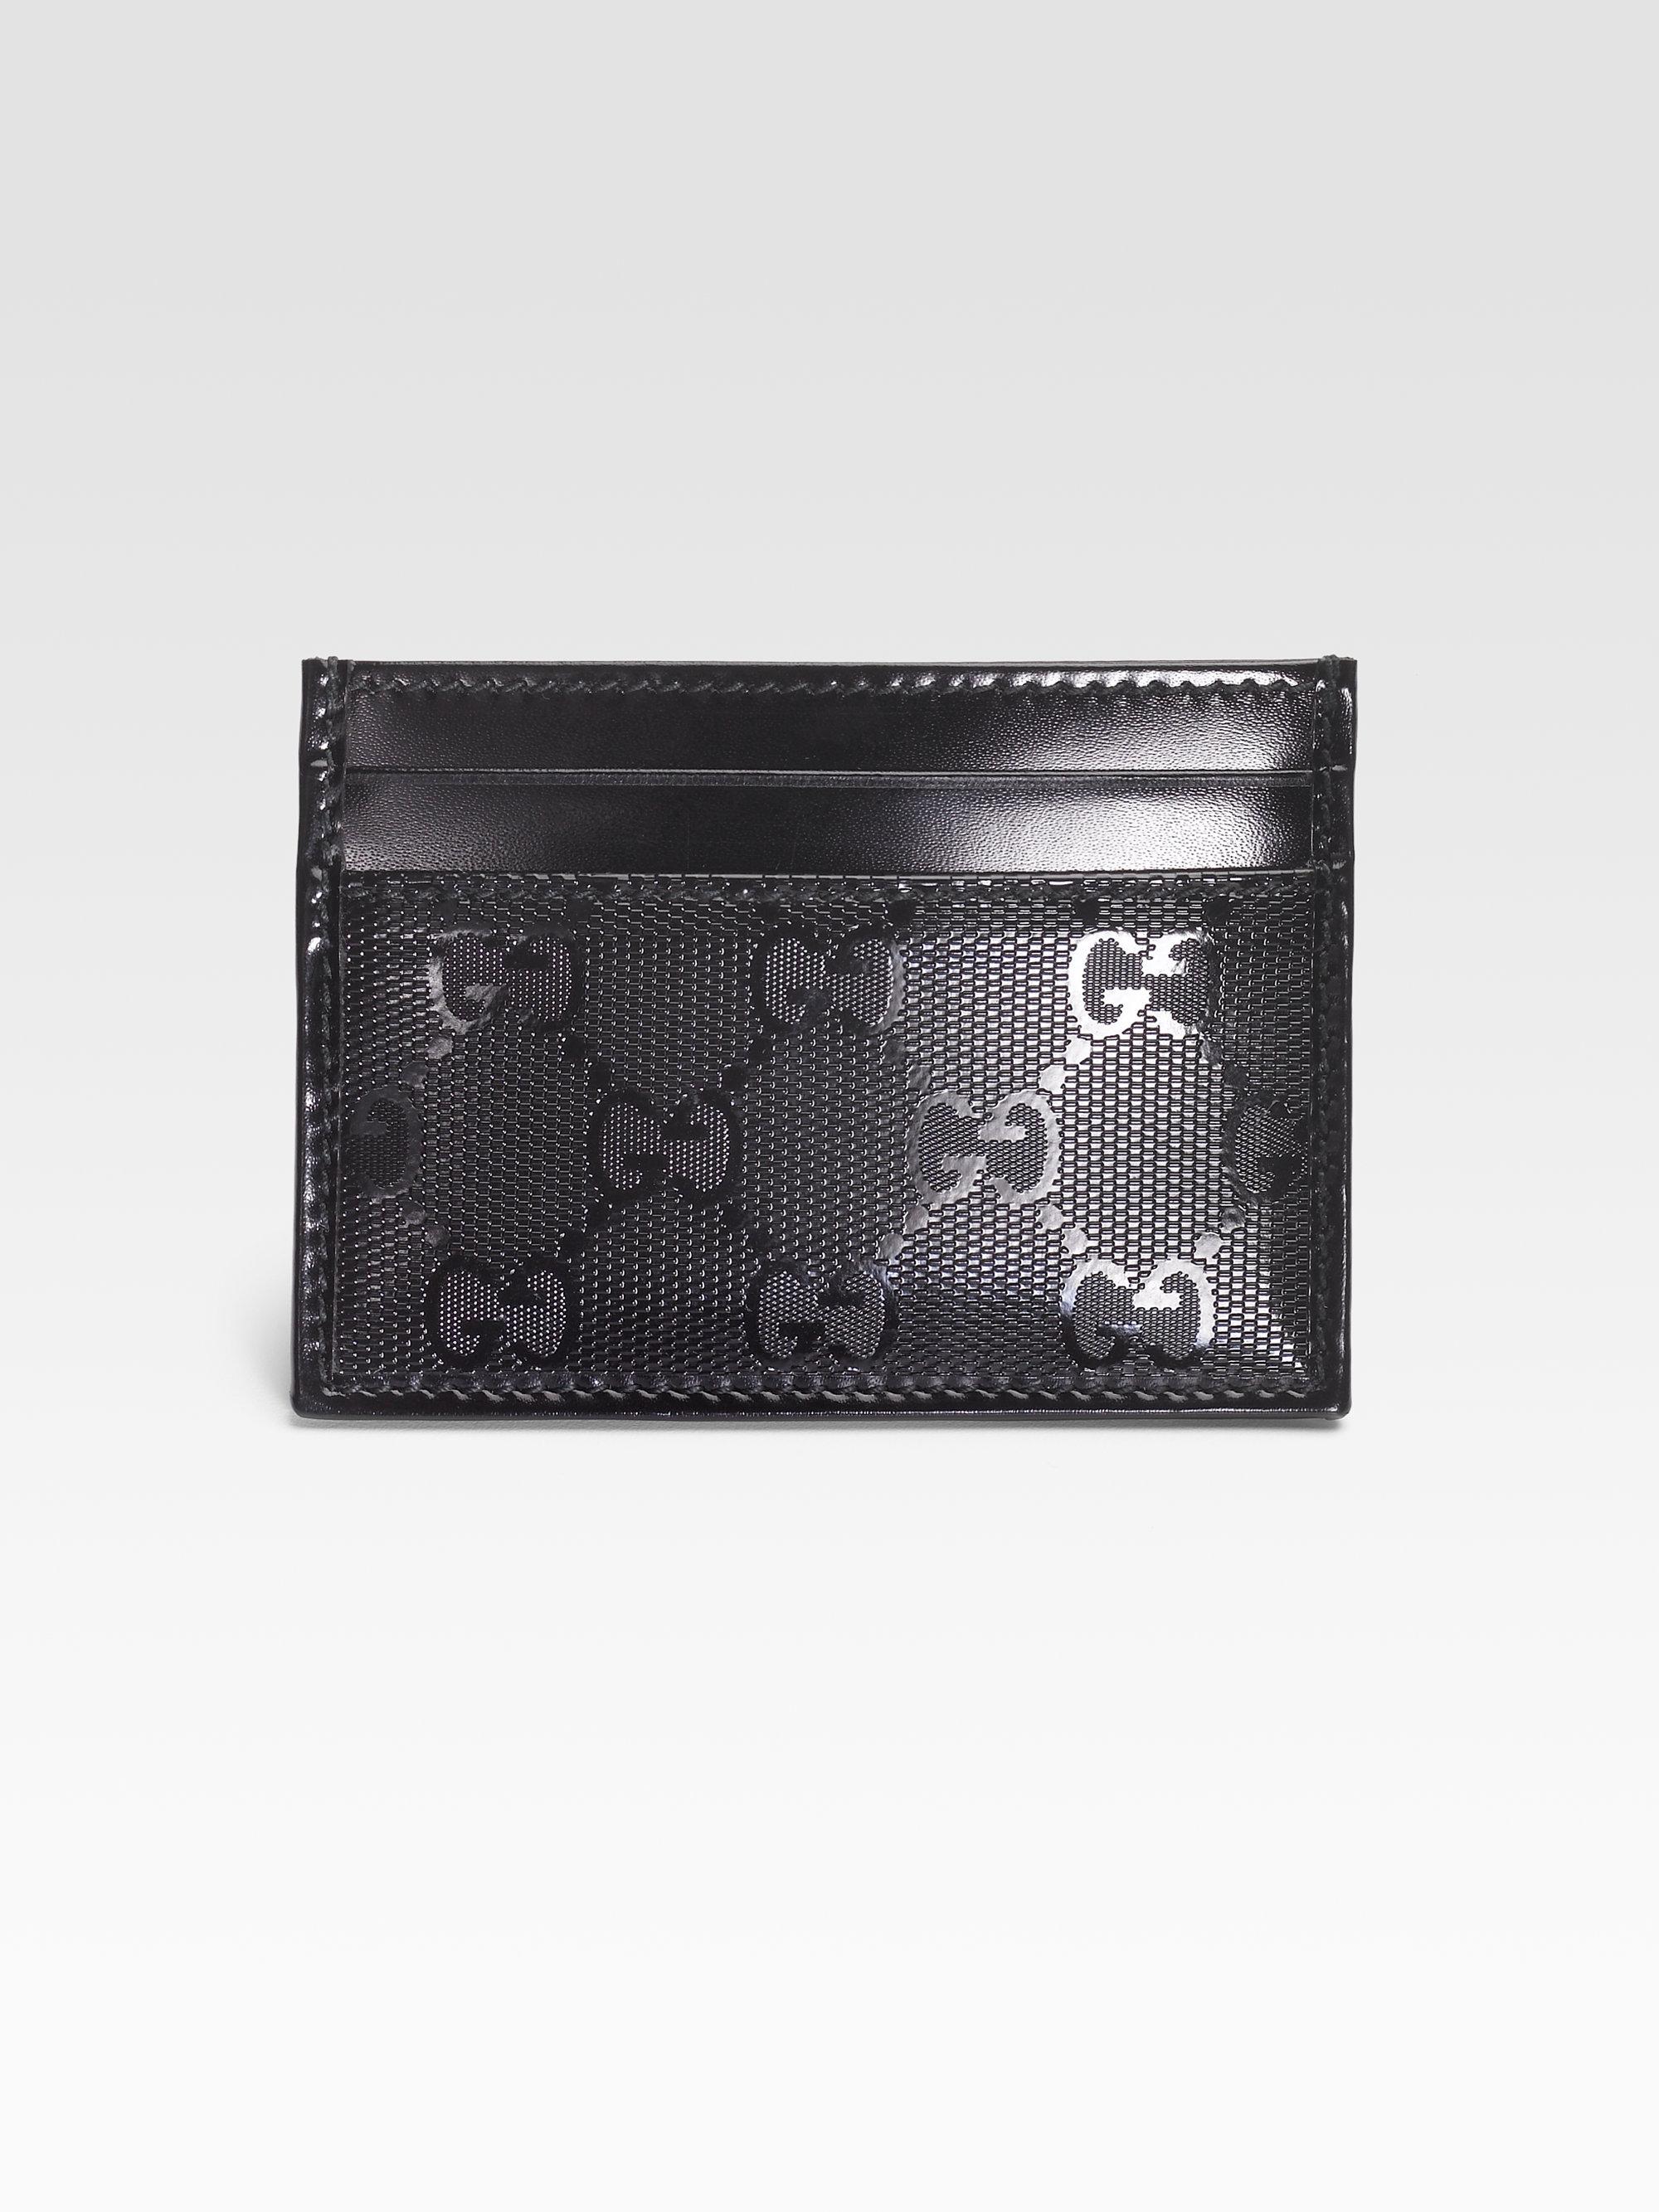 73ab039f025 Gucci Gg Imprime Card Case in Black for Men - Lyst